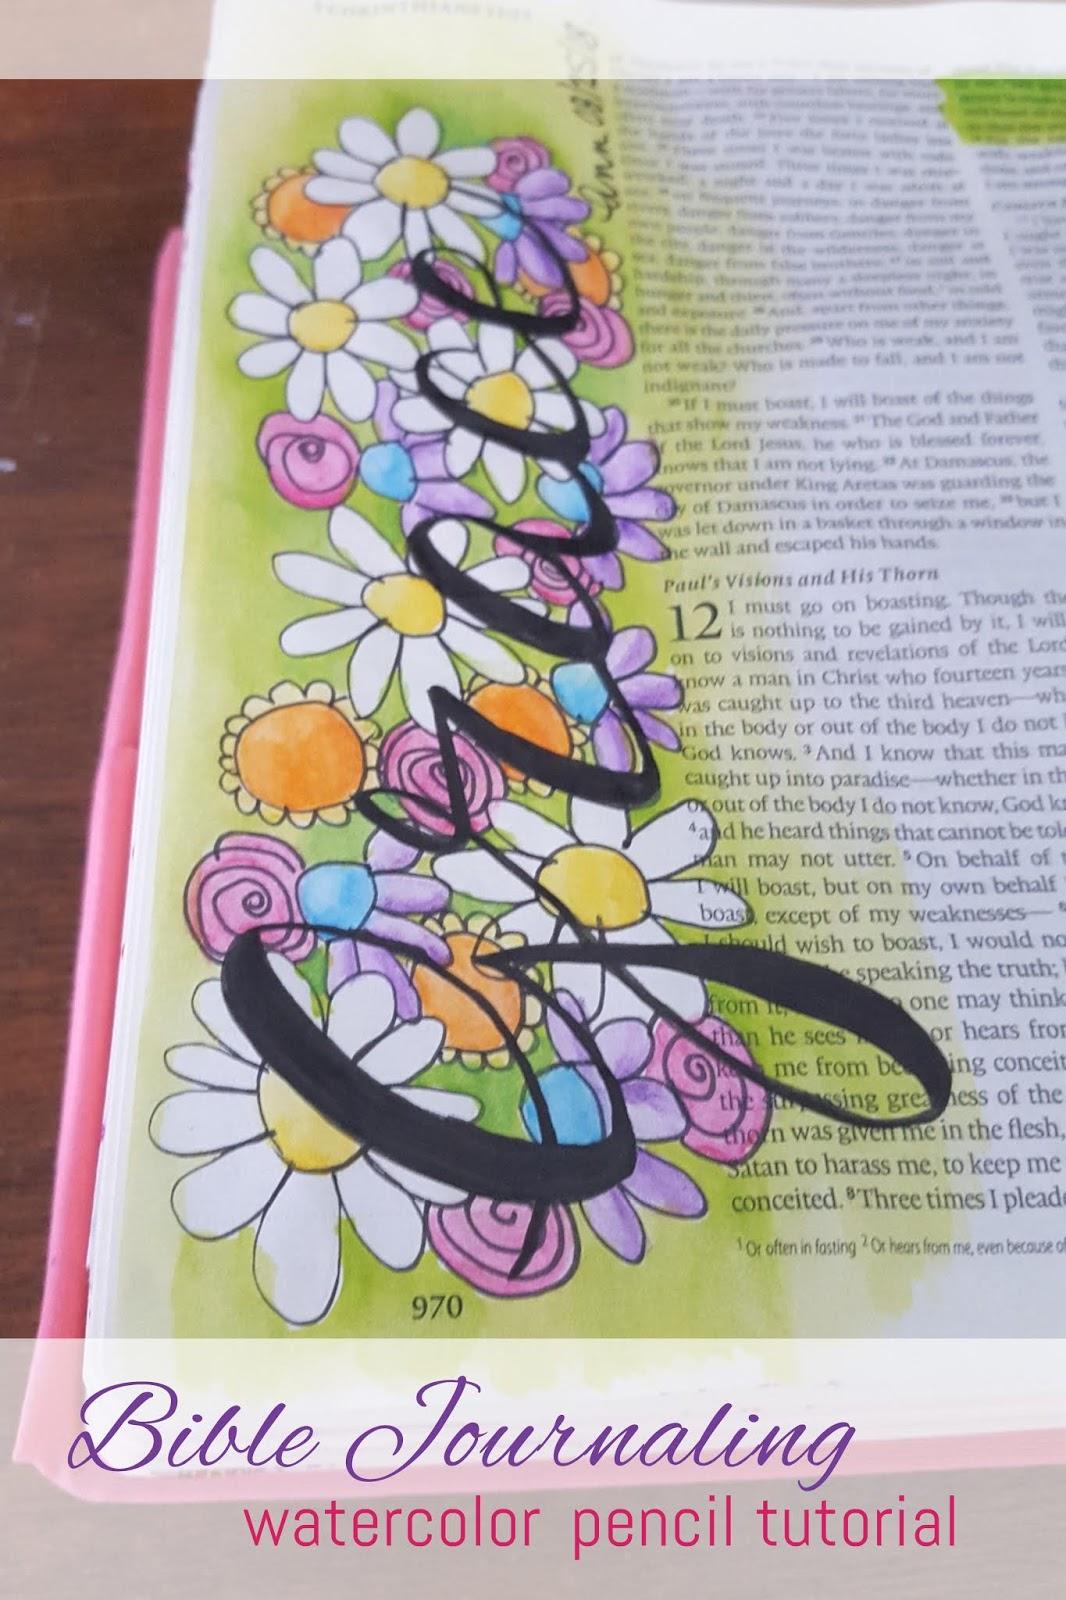 ann dreyer designs bible journaling grace watercolor pencil tutorial